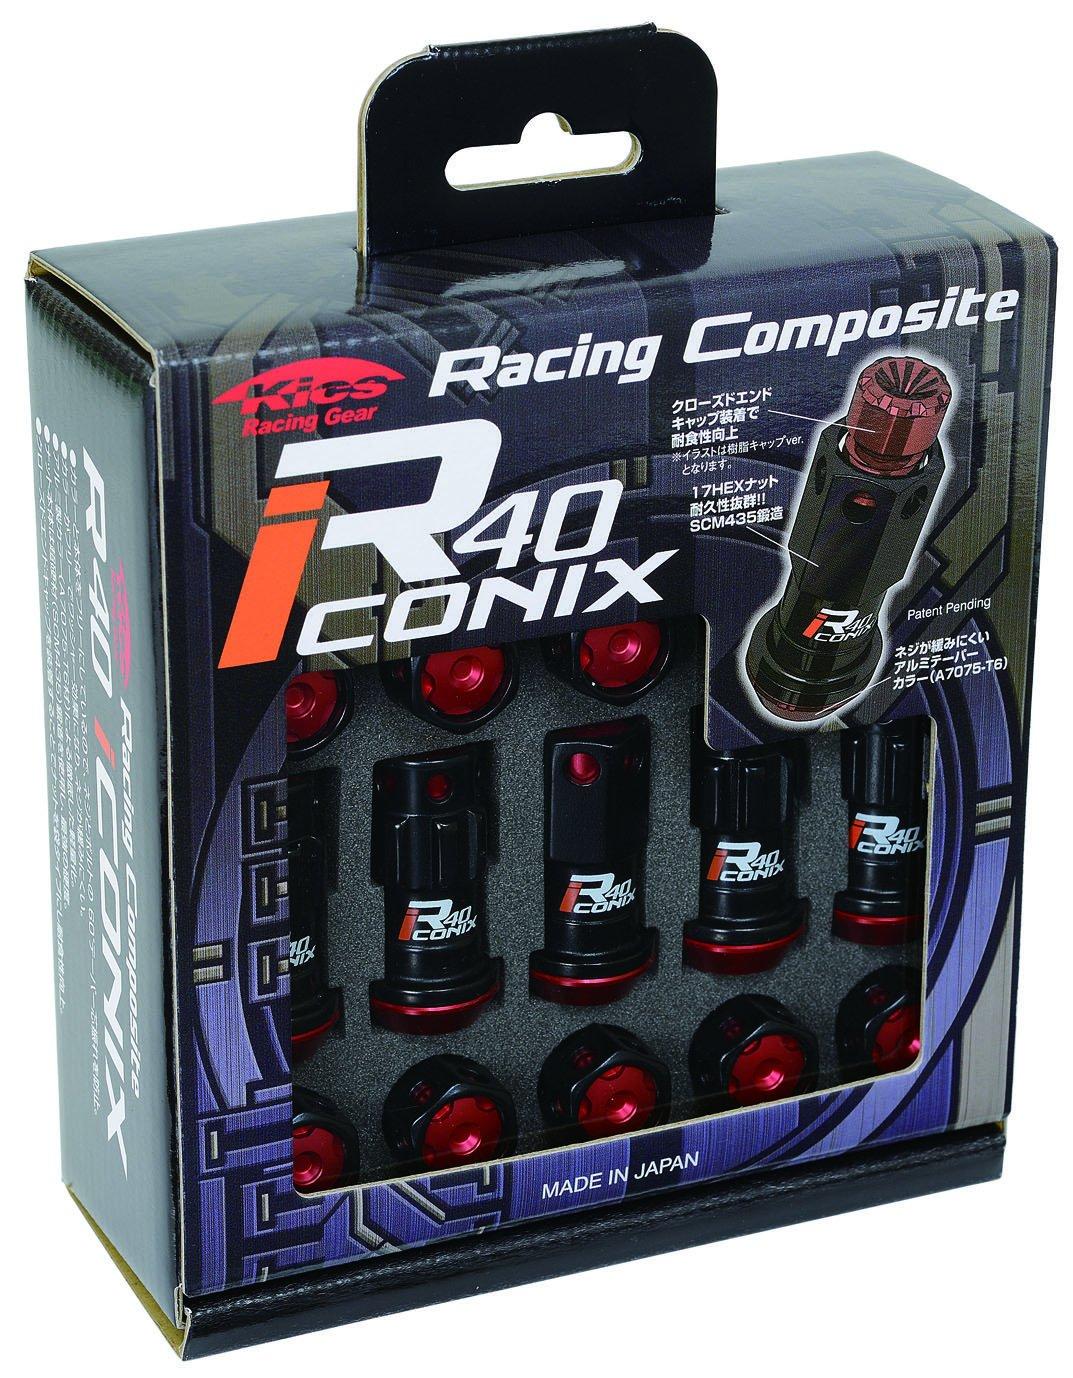 KYO-EI (協永産業) ホイールロックナット Racing Composite R40 iCONIX 【 M12 x P1.25 】 アルミキャップ付 【 ブラック/ブルー 】 RIA-13KU B00OYSJBGI